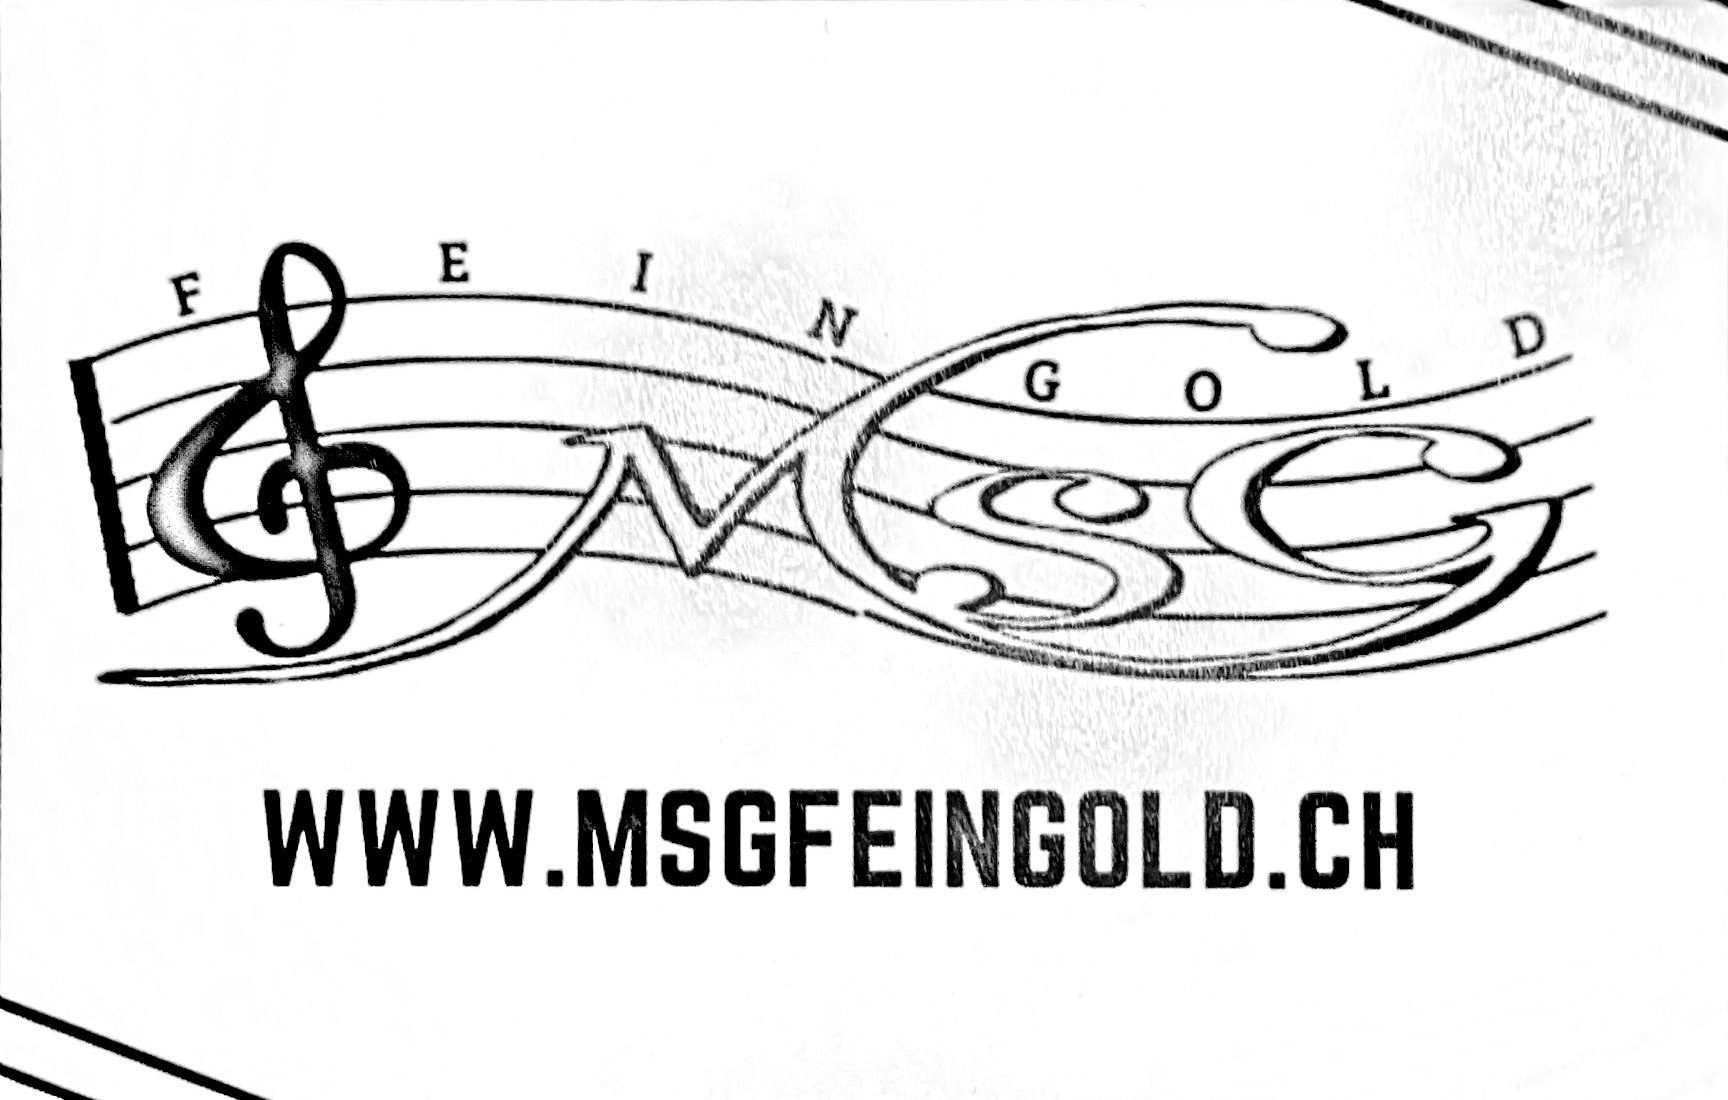 msgfeingold